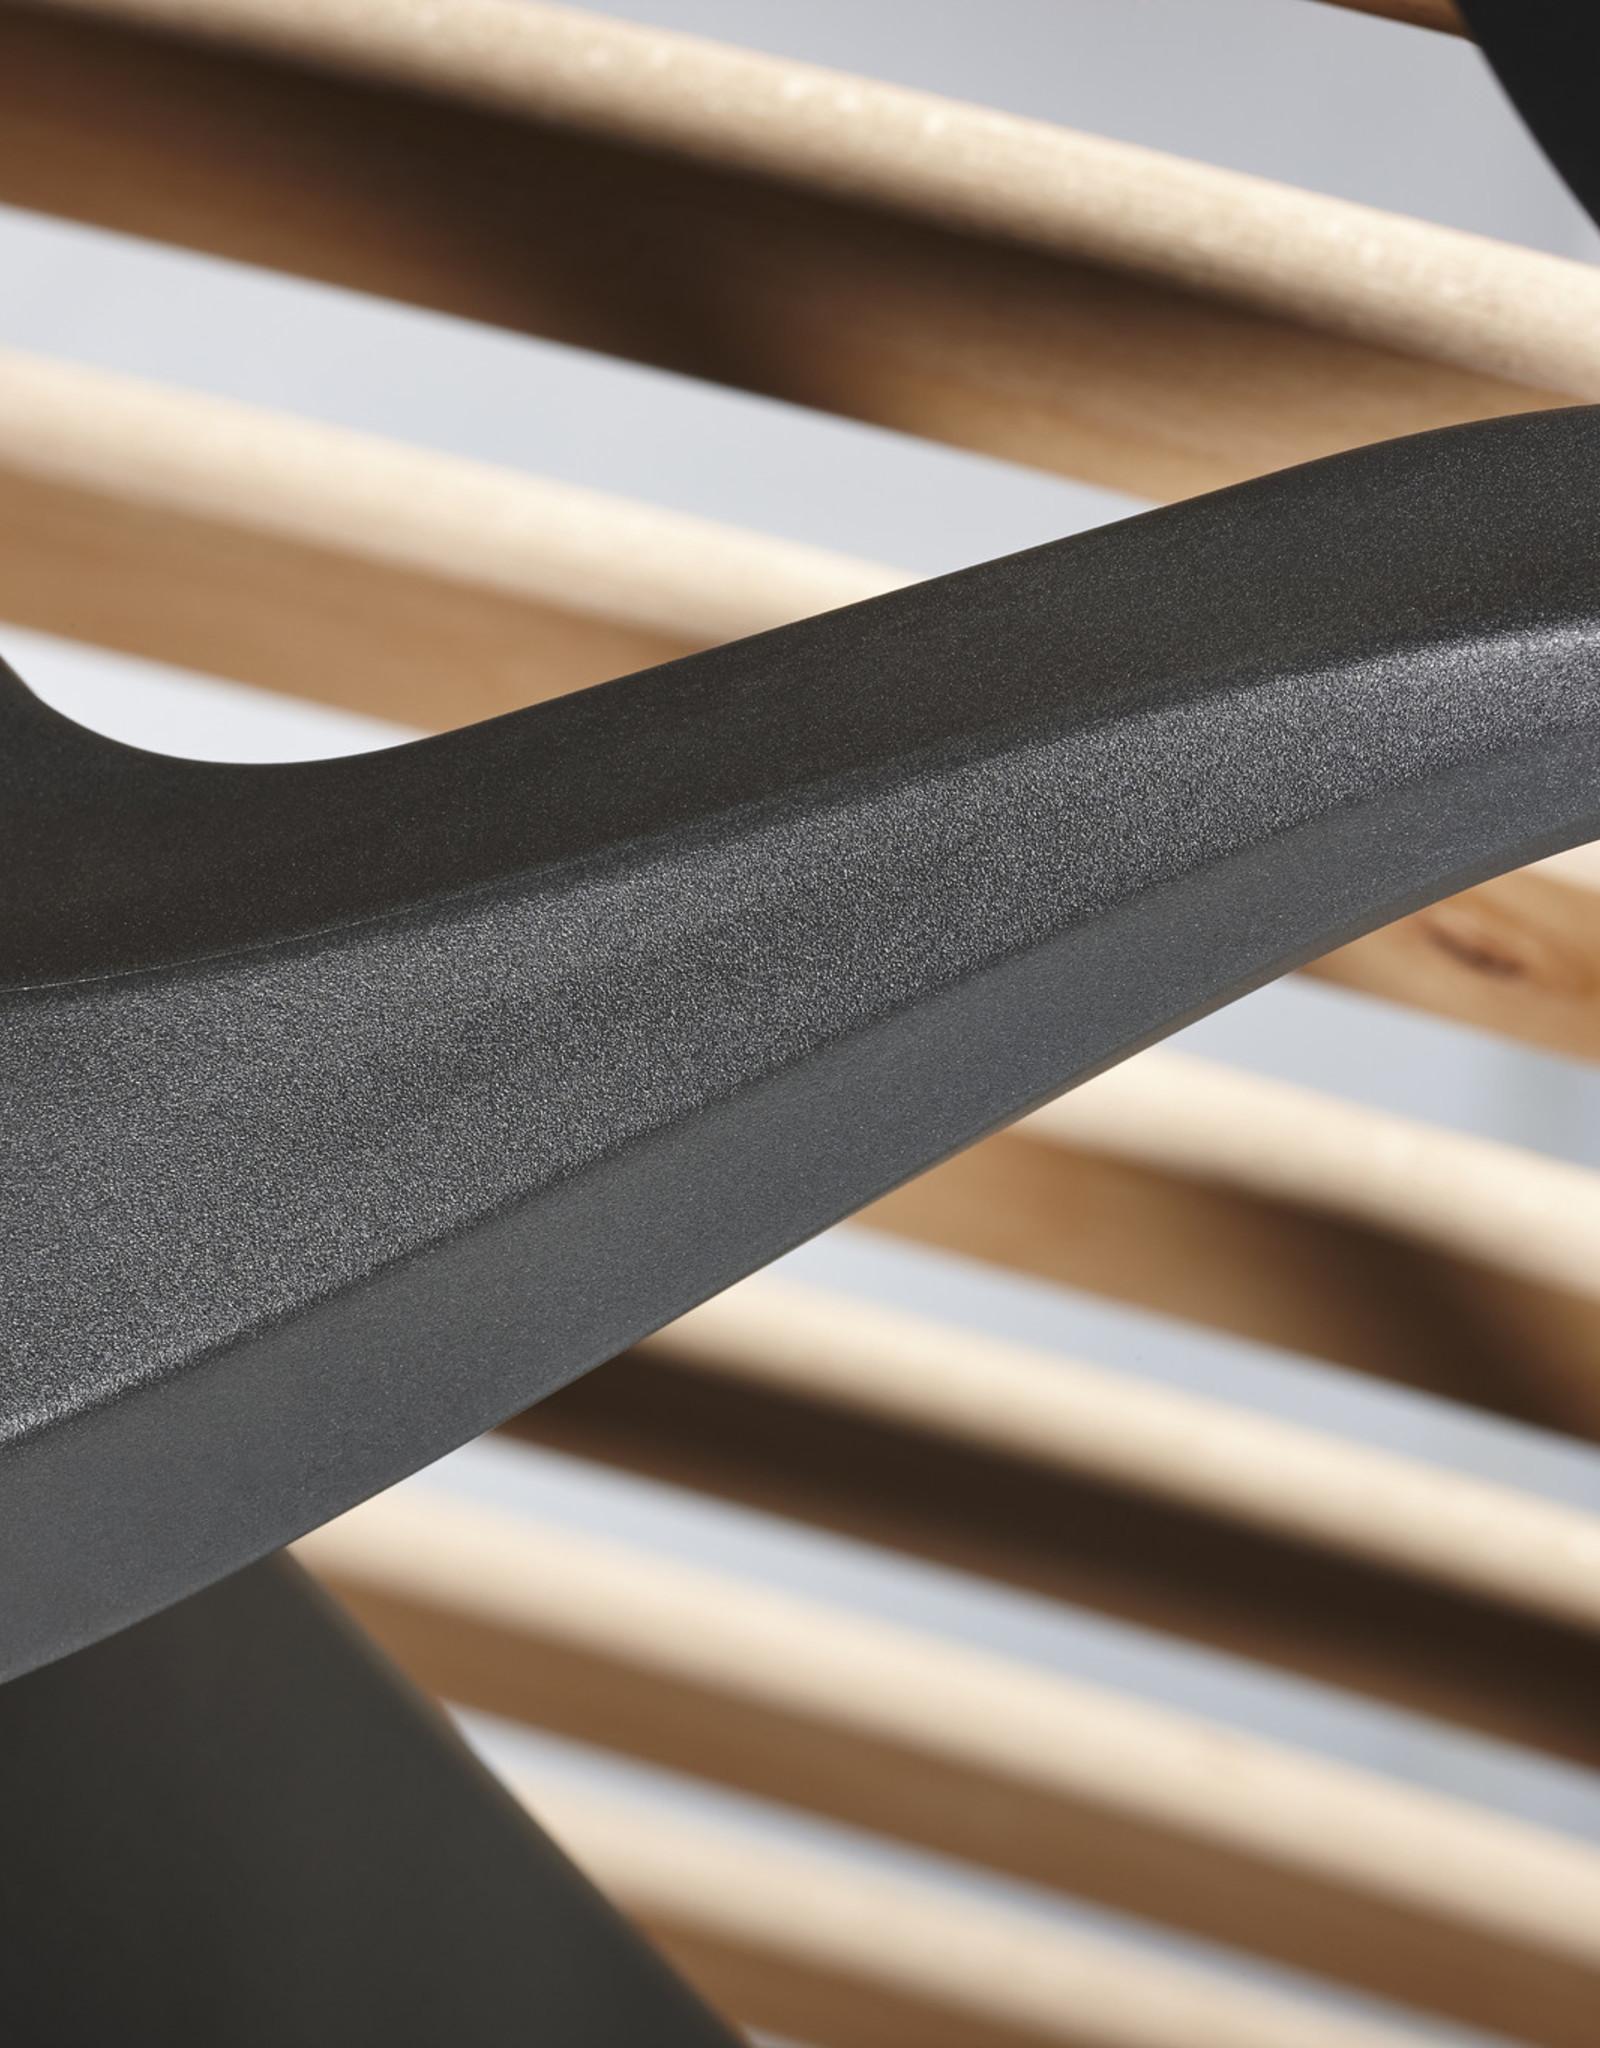 Swissflex Lattenbodem Uni 22-35 hoofd, rug & voet